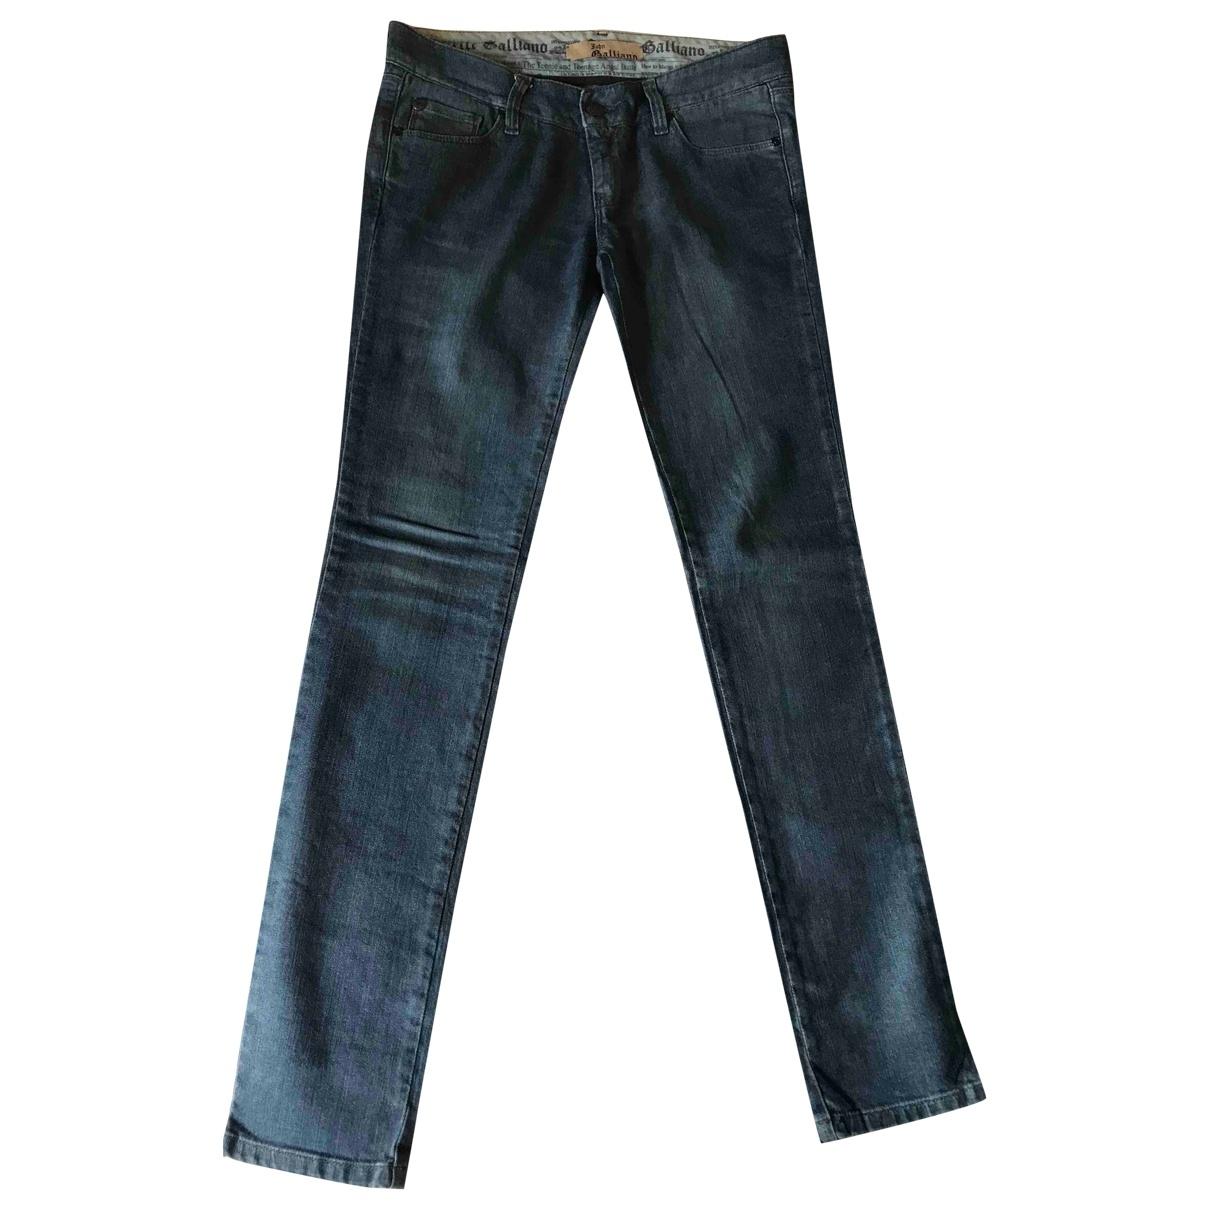 John Galliano \N Blue Denim - Jeans Trousers for Kids 14 years - S UK